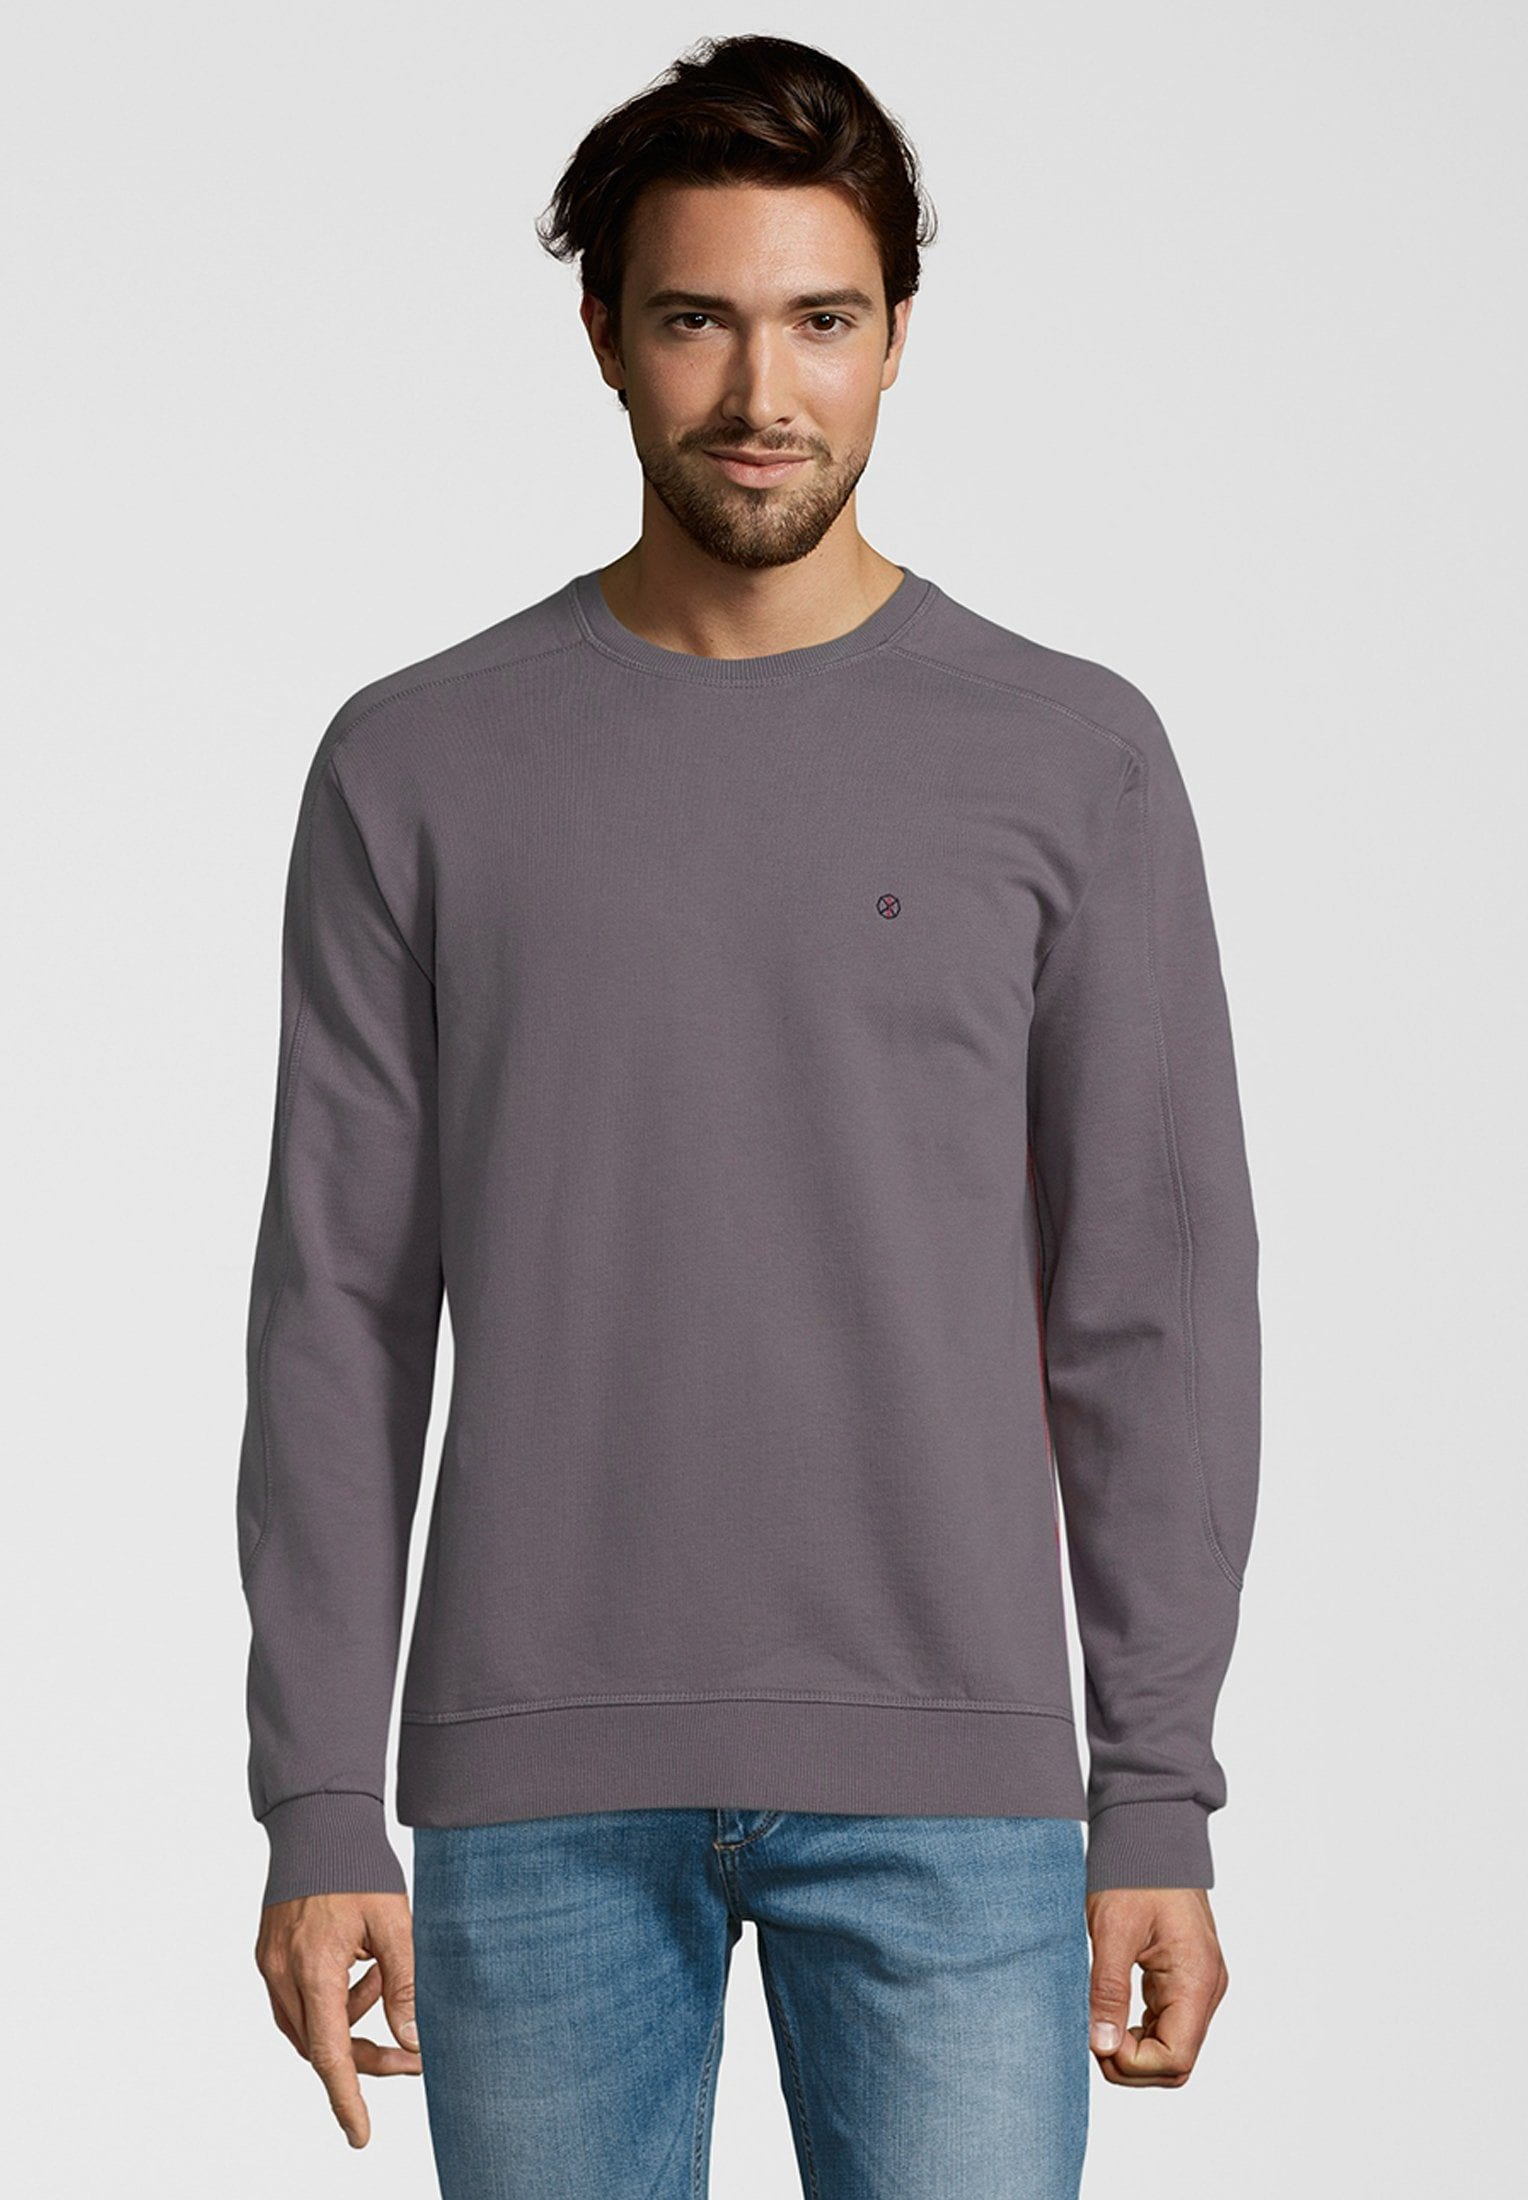 shirts for life -  Sweatshirt BRIAN